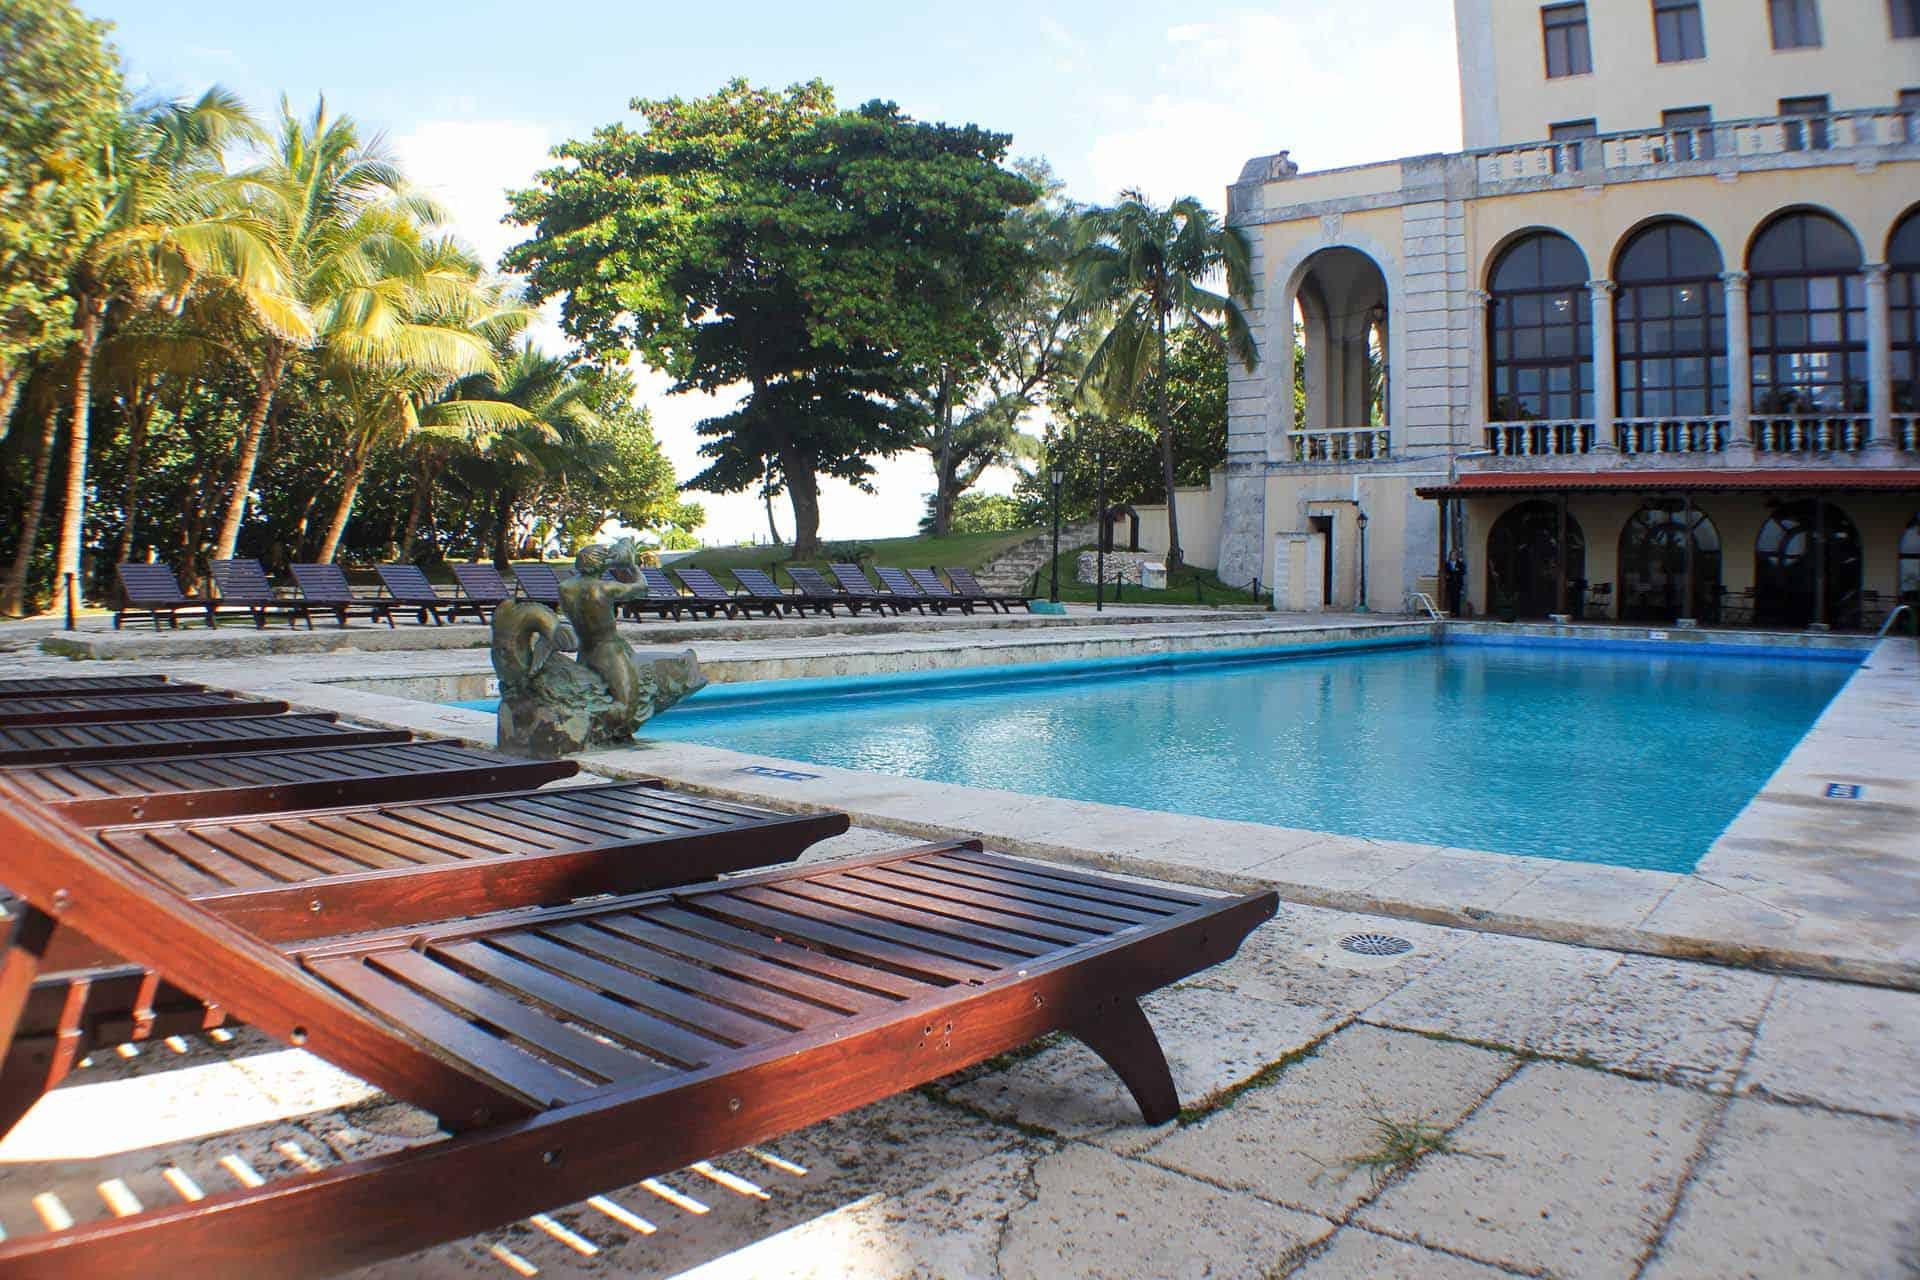 H3061 Hotel Nacional 08 cuba autrement